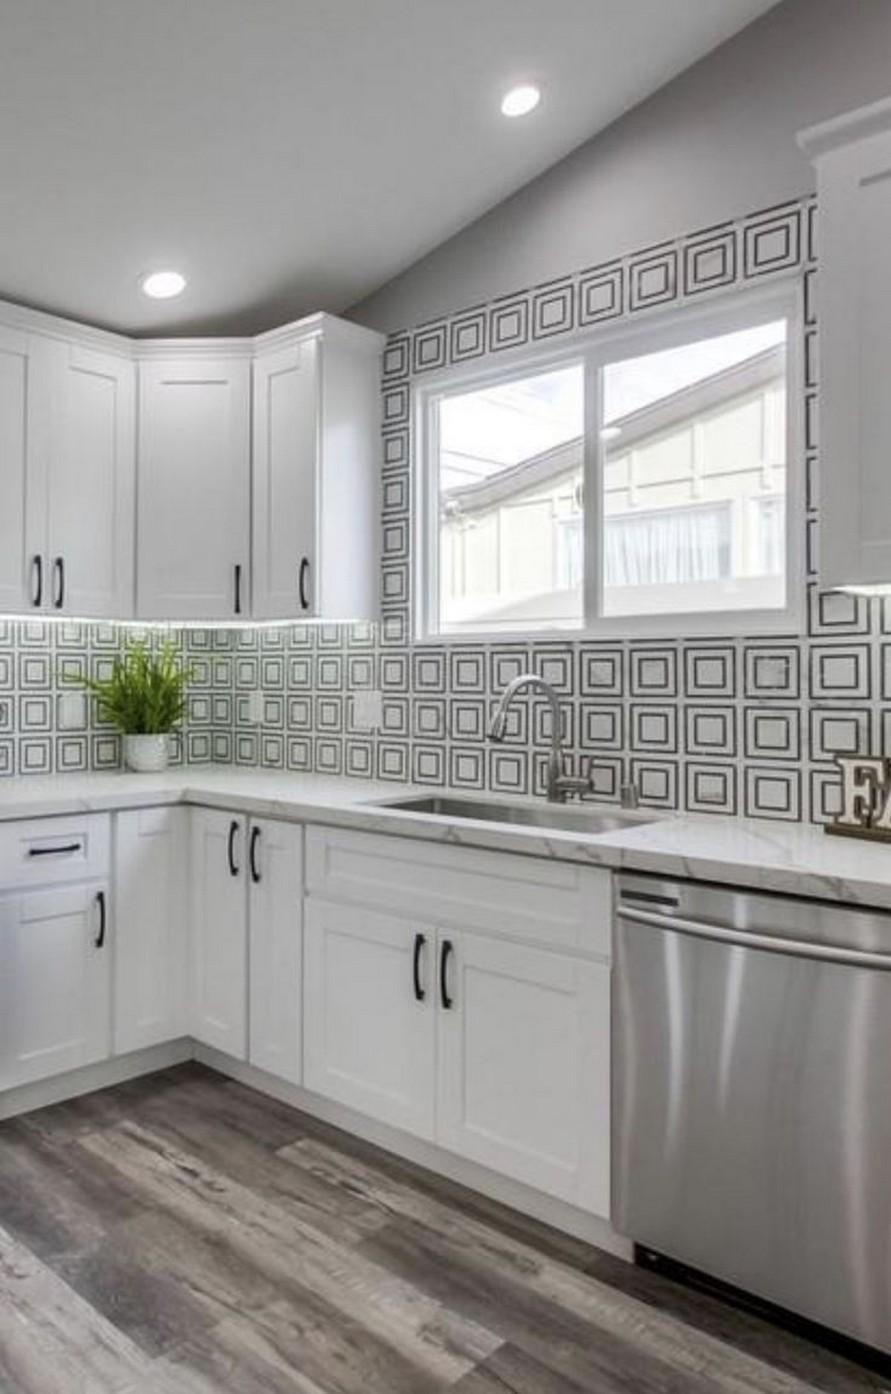 12 Simple Kitchen Backsplash Ideas Home Decor 28